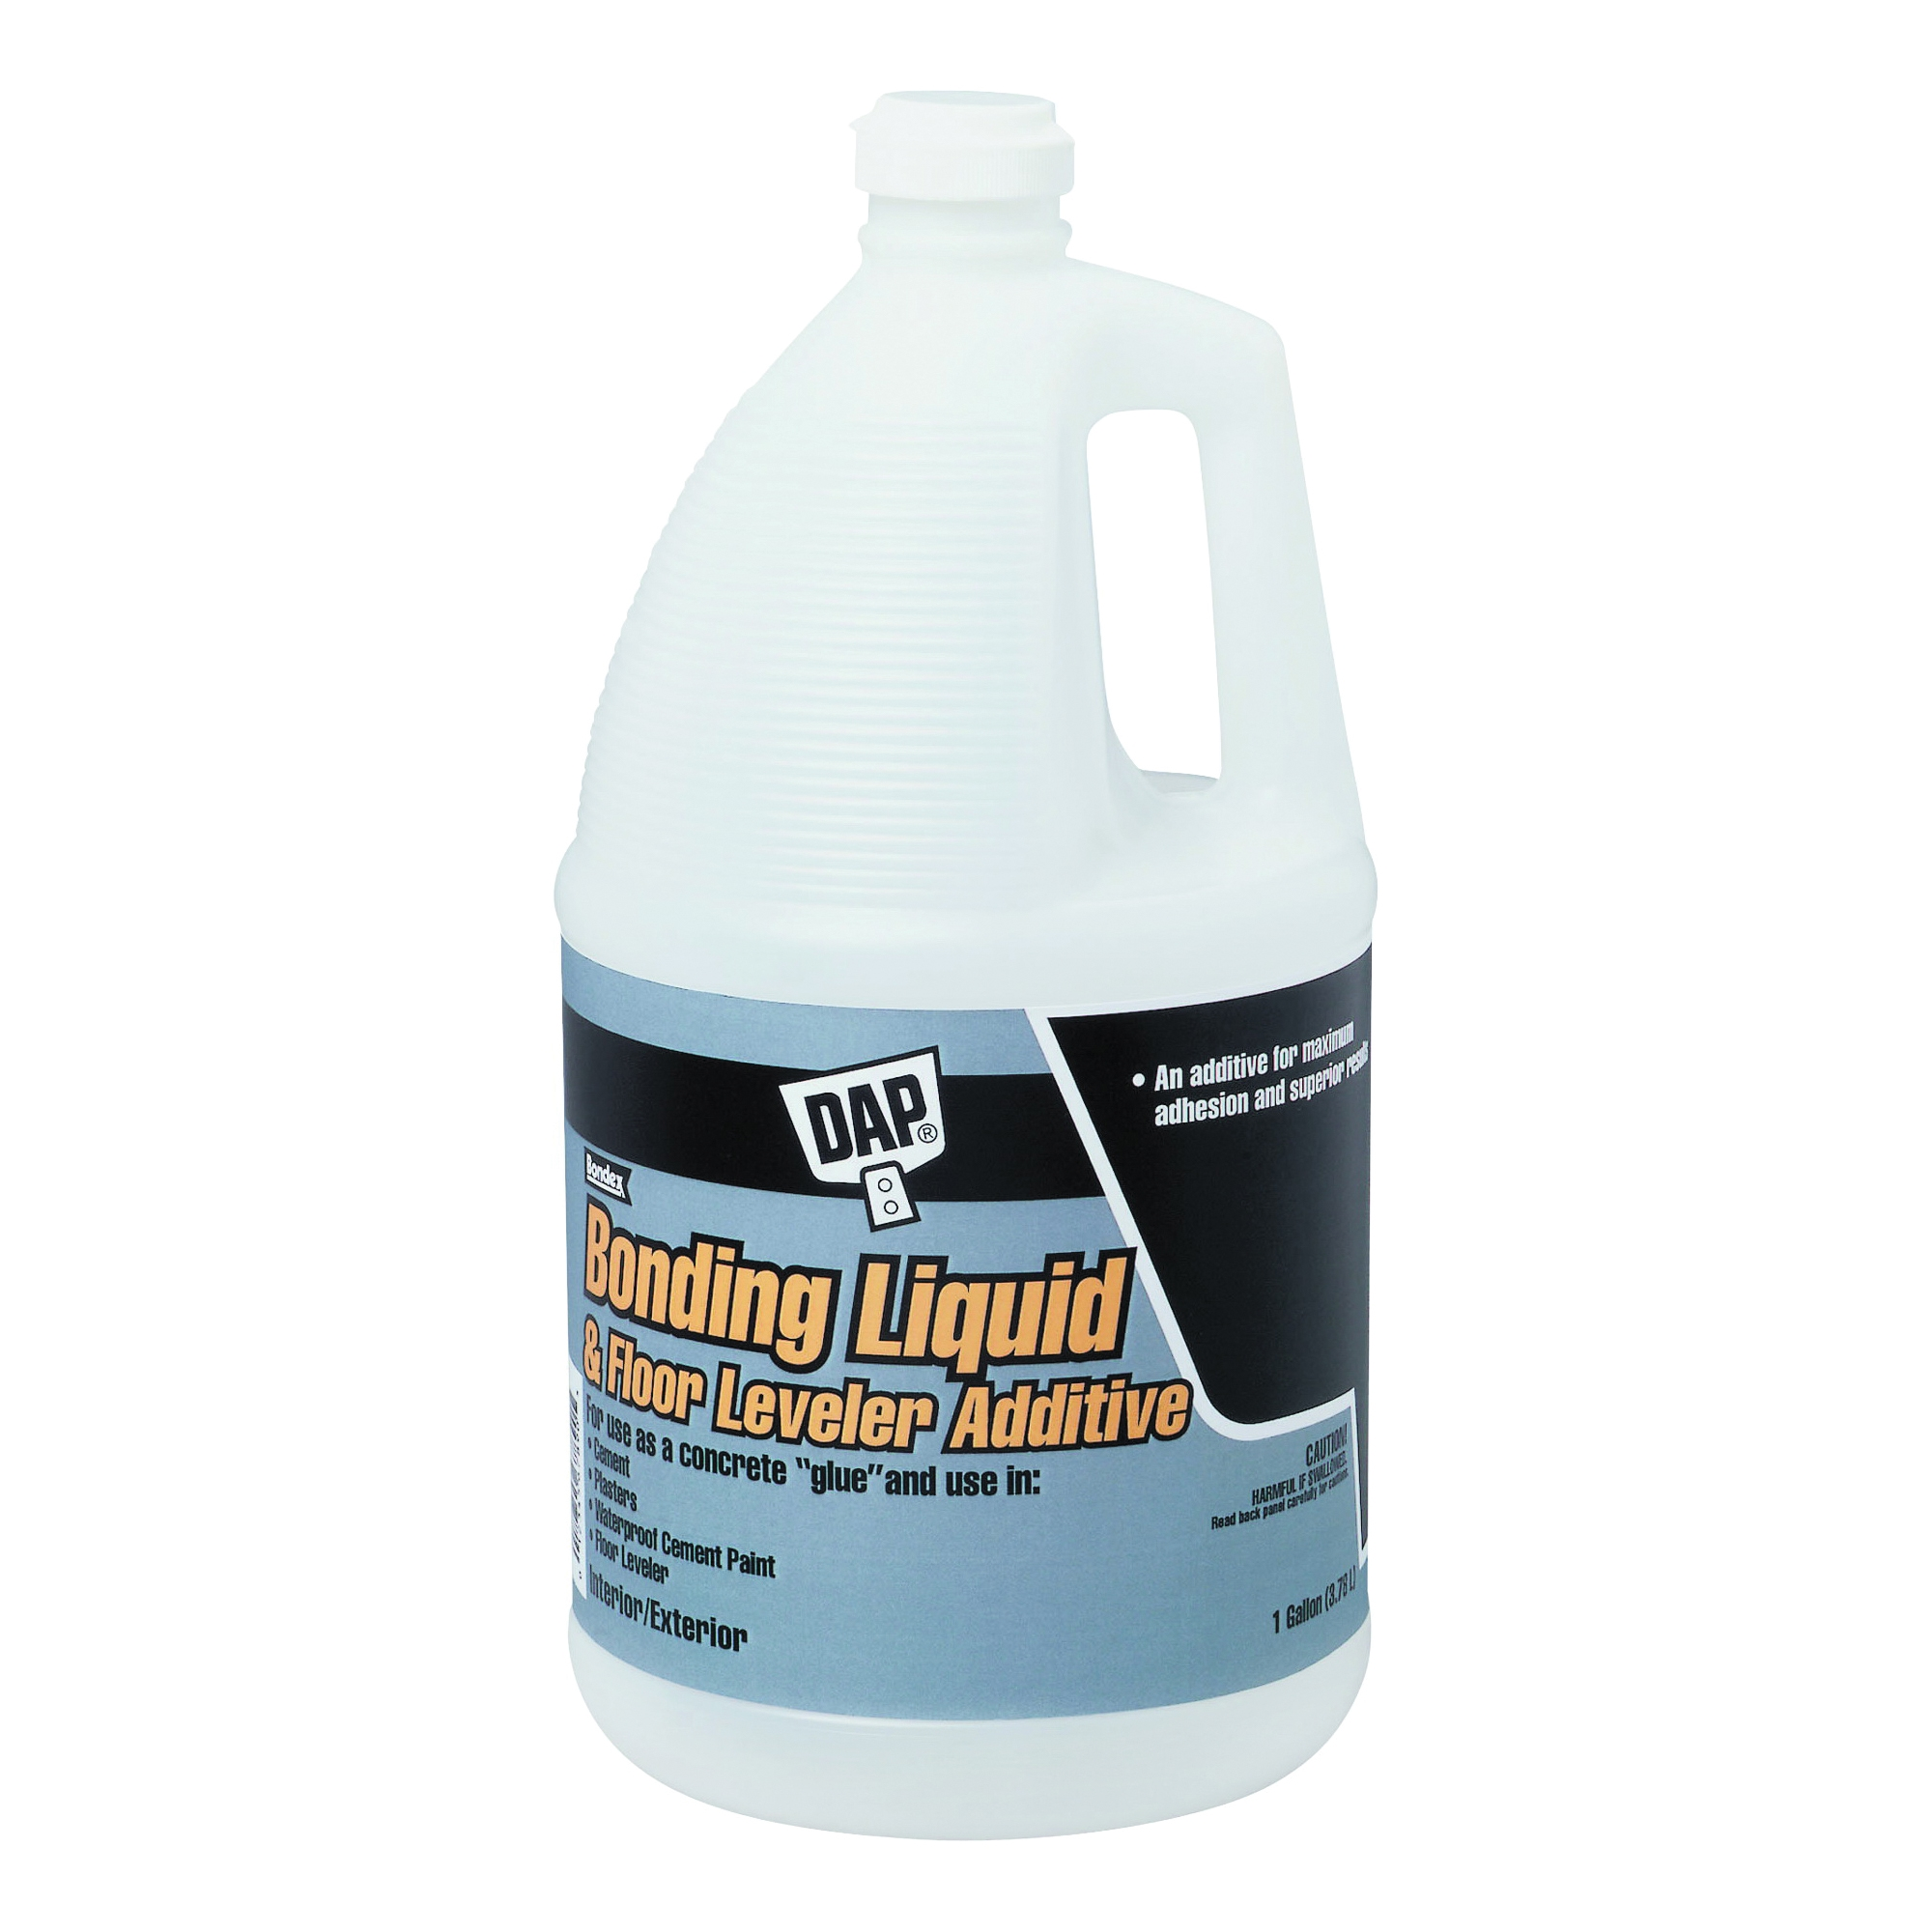 Picture of DAP 35090 Floor Leveler Additive, Liquid, White, 1 gal Package, Bottle